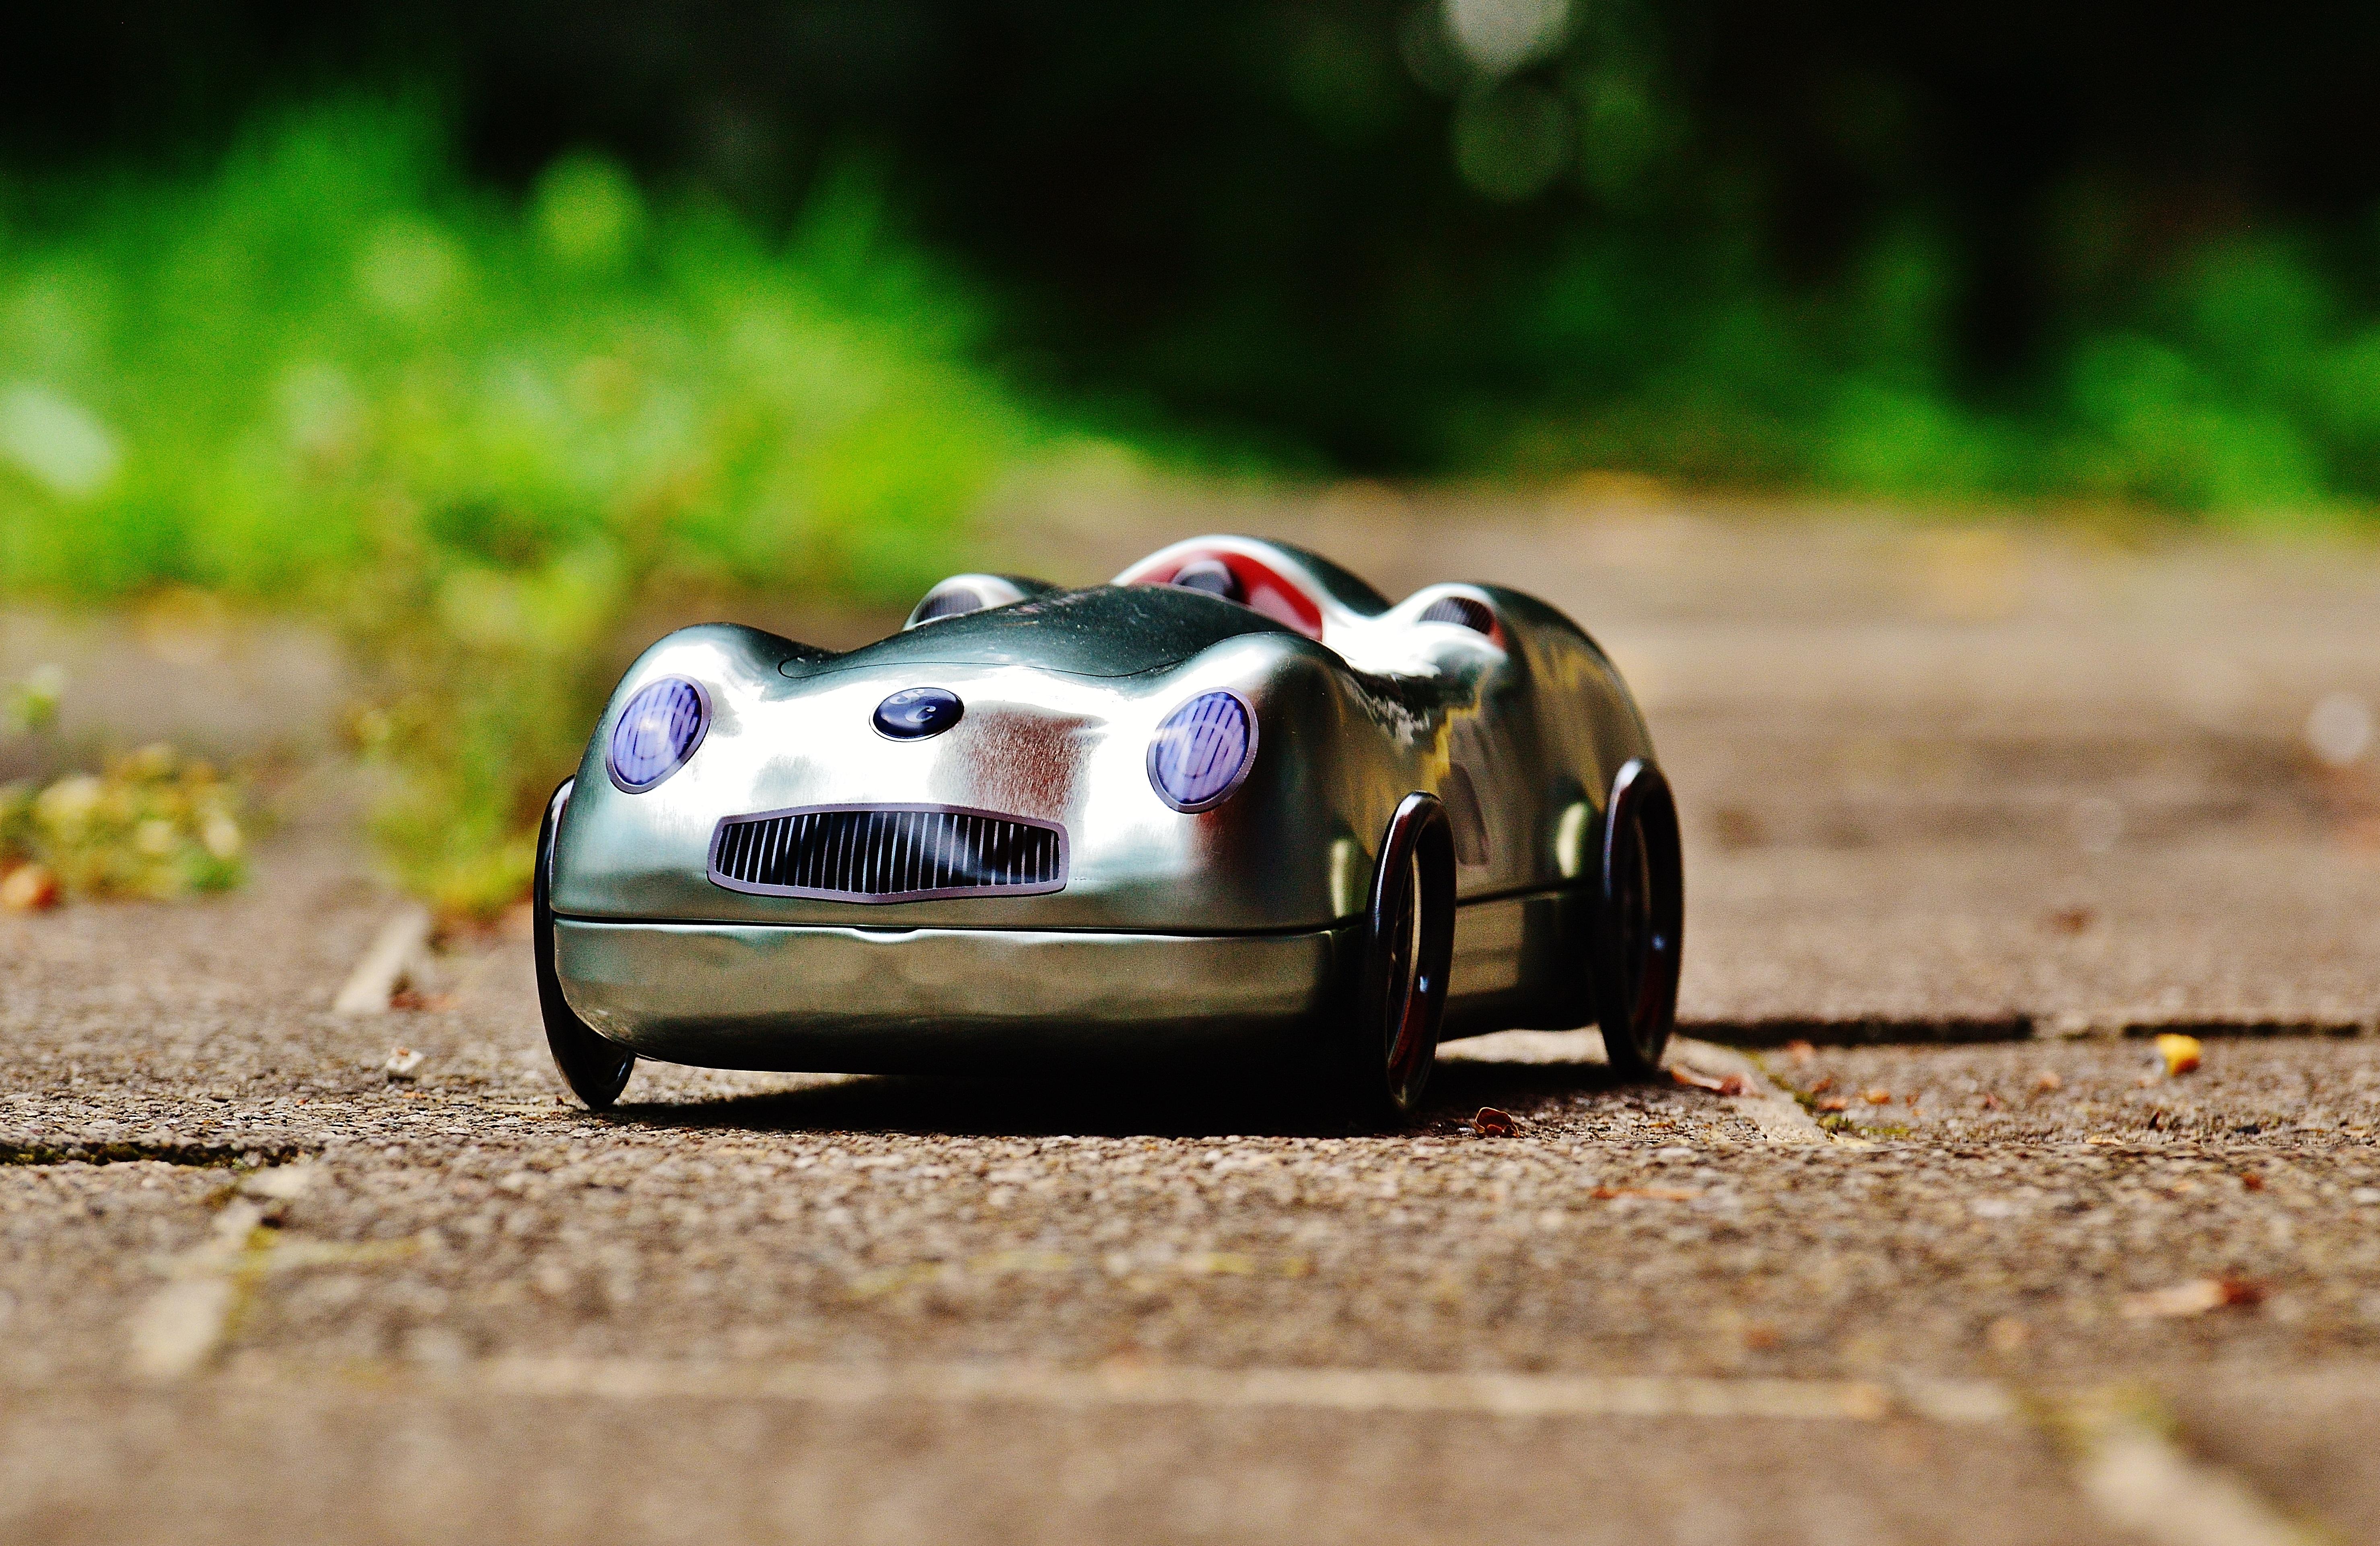 Free Images : auto, box, sports car, storage, sheet, race car ...